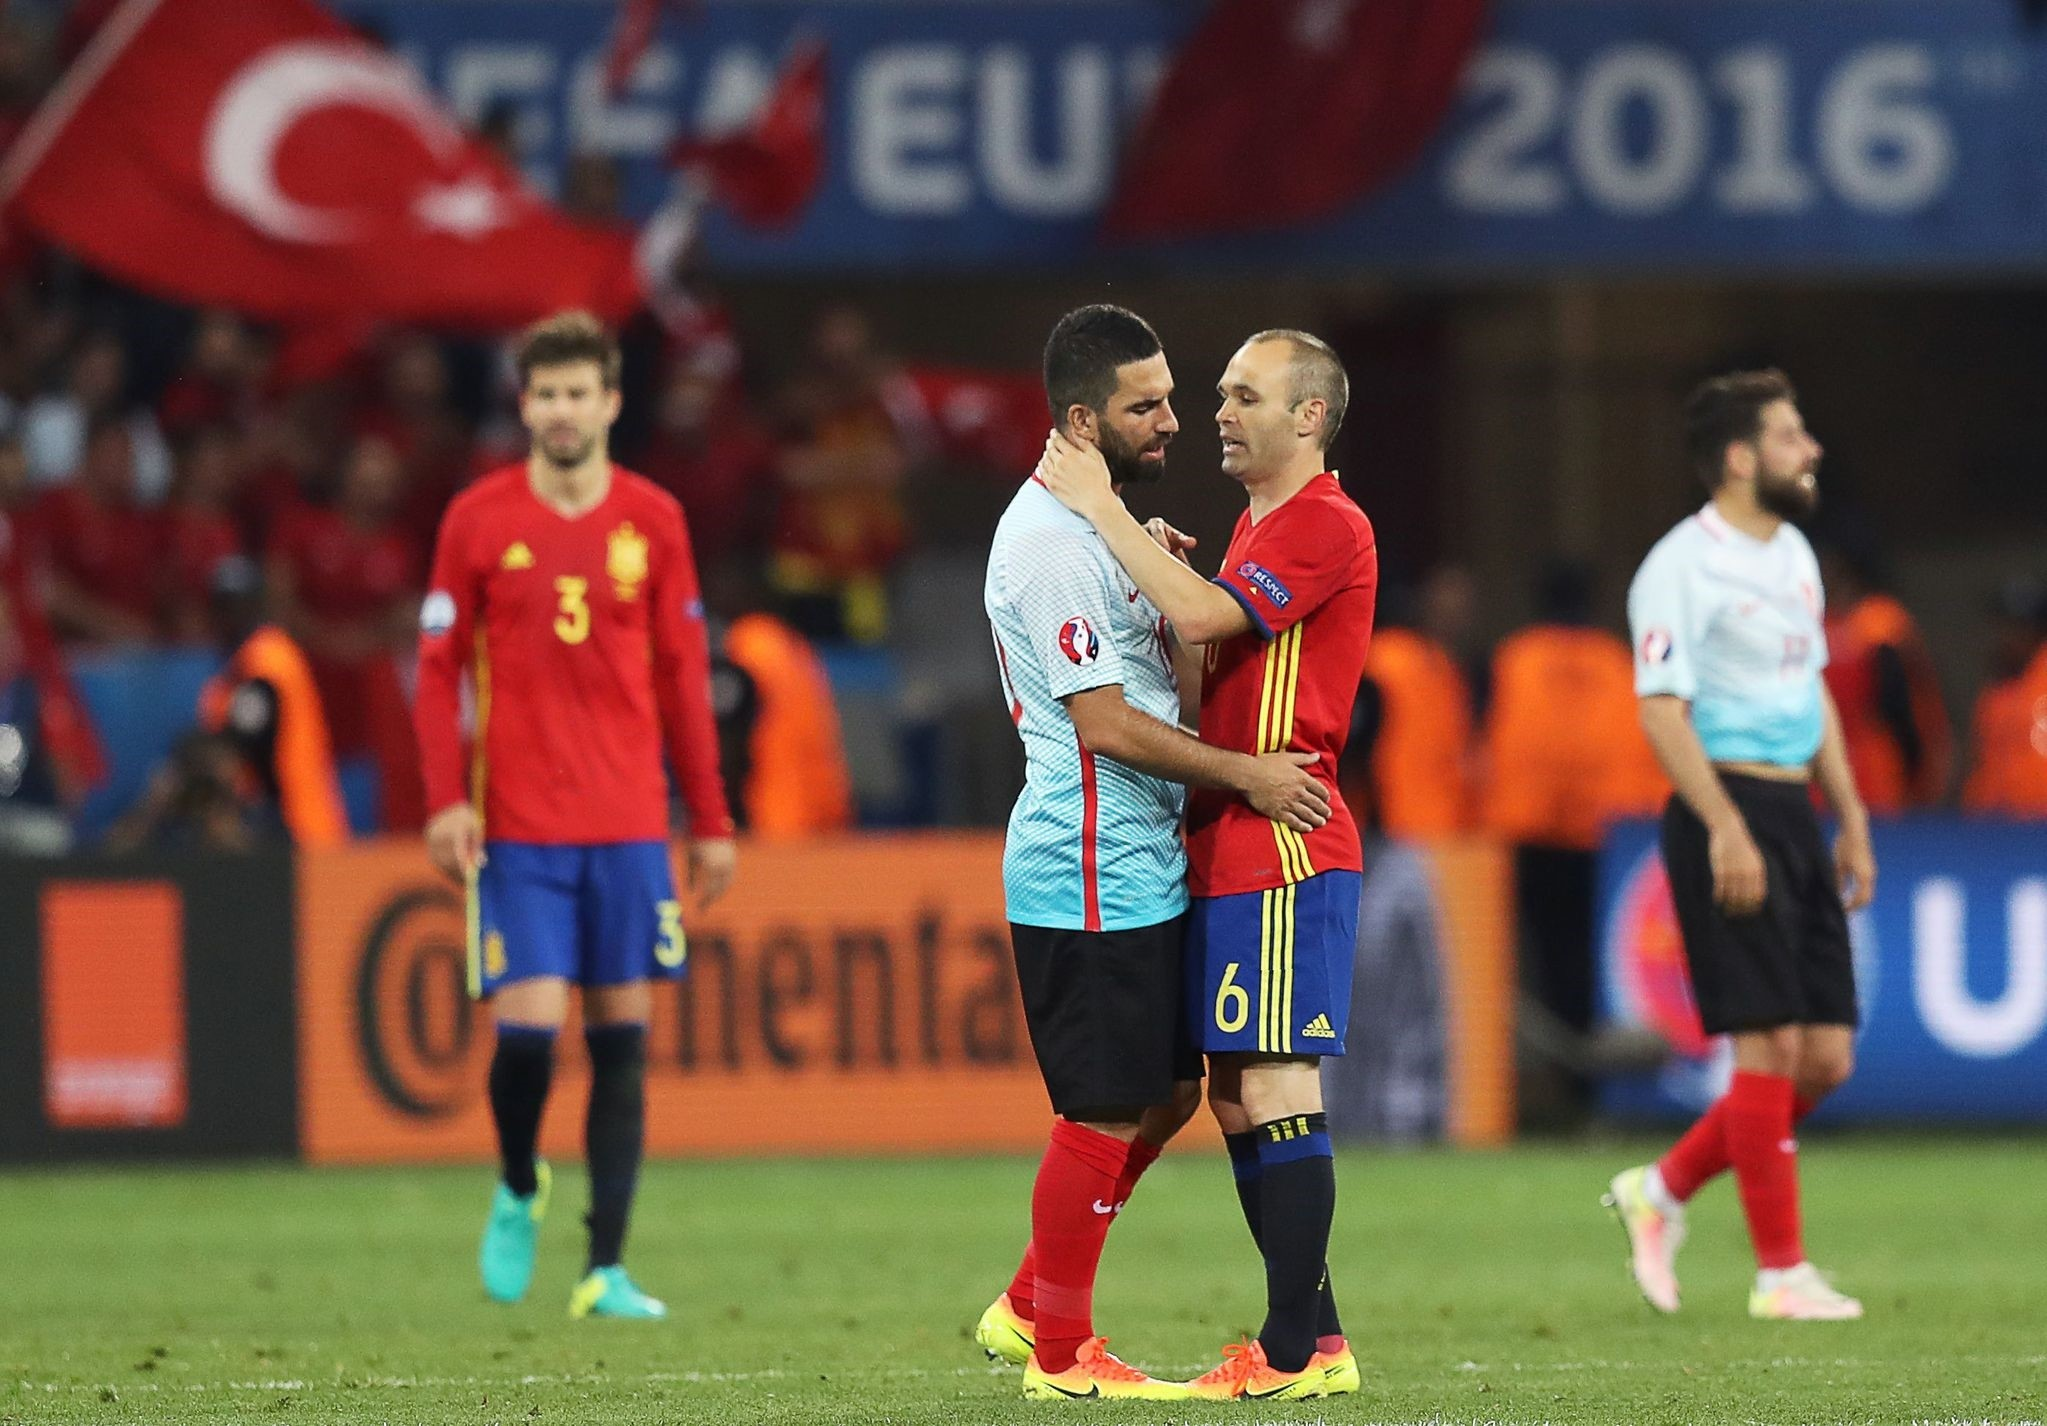 Spain's midfielder Andres Iniesta (C-R) encourages Turkey's midfielder Arda Turan (C-L) following the Euro 2016 group D football match between Spain and Turkey stadium in Nice on June 17, 2016.  (AFP PHOTO)